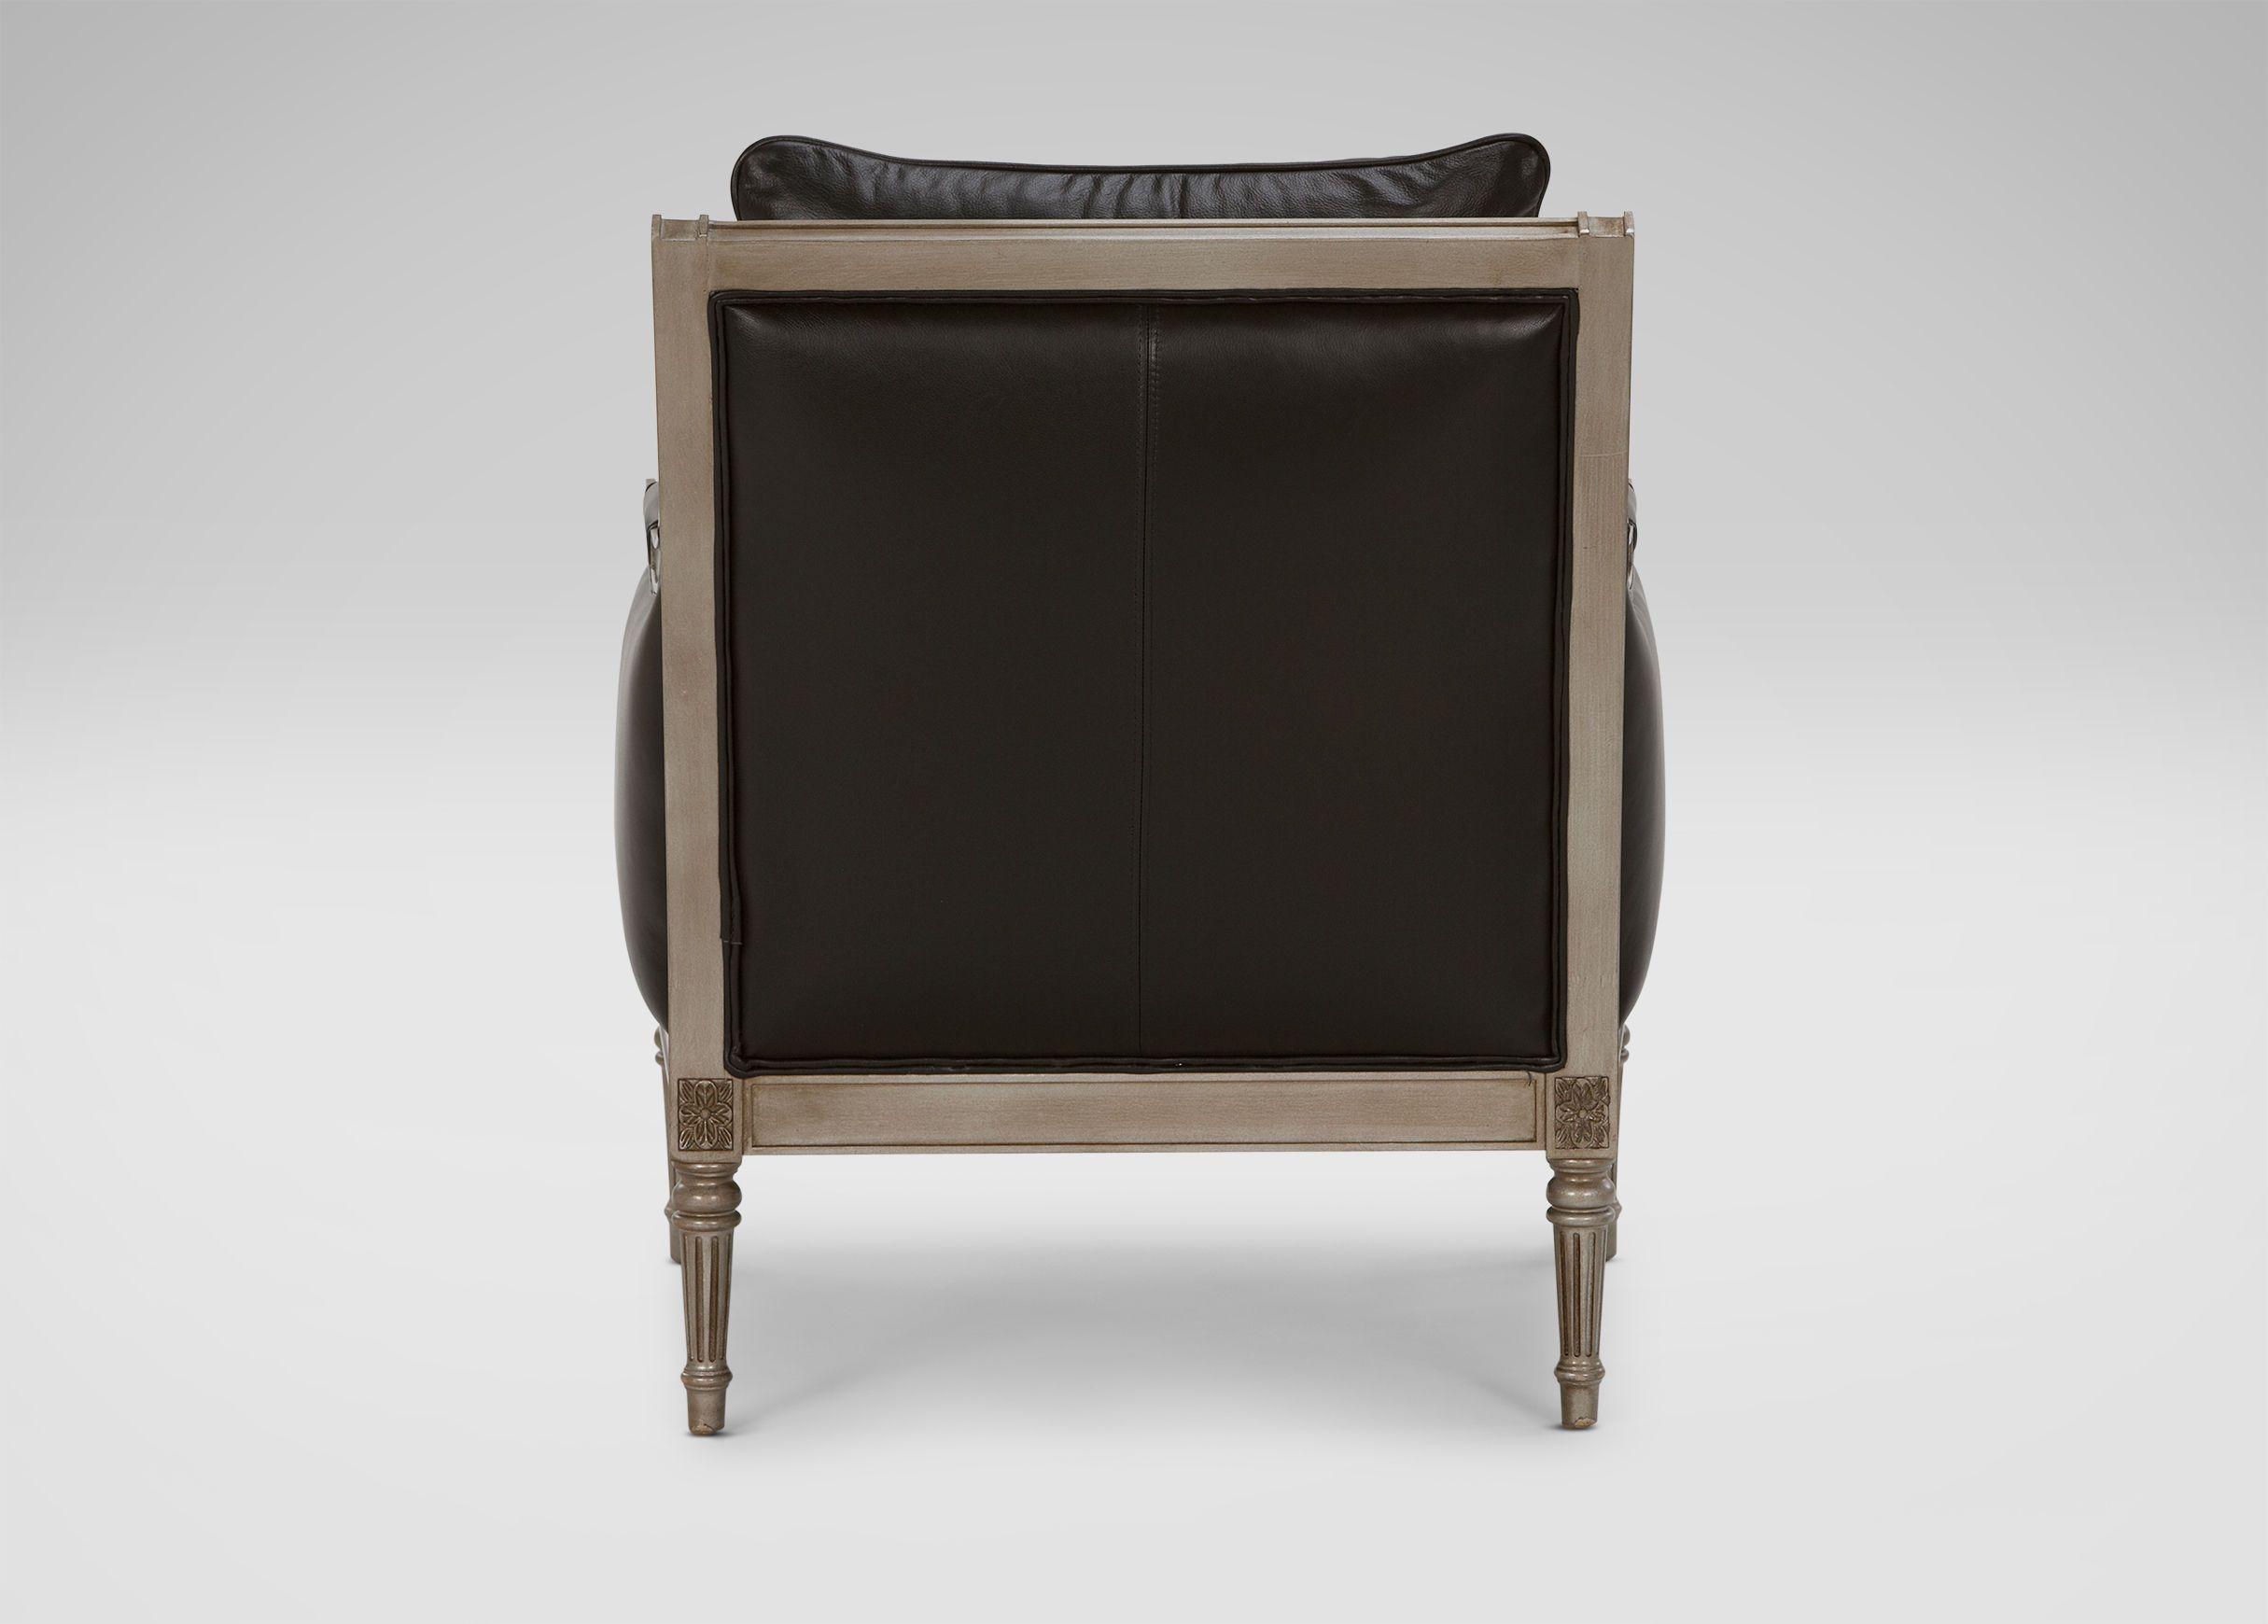 Paul schatz furniture portland or  Fairfax Leather Chair  Chair for pinboard  Pinterest  Living room